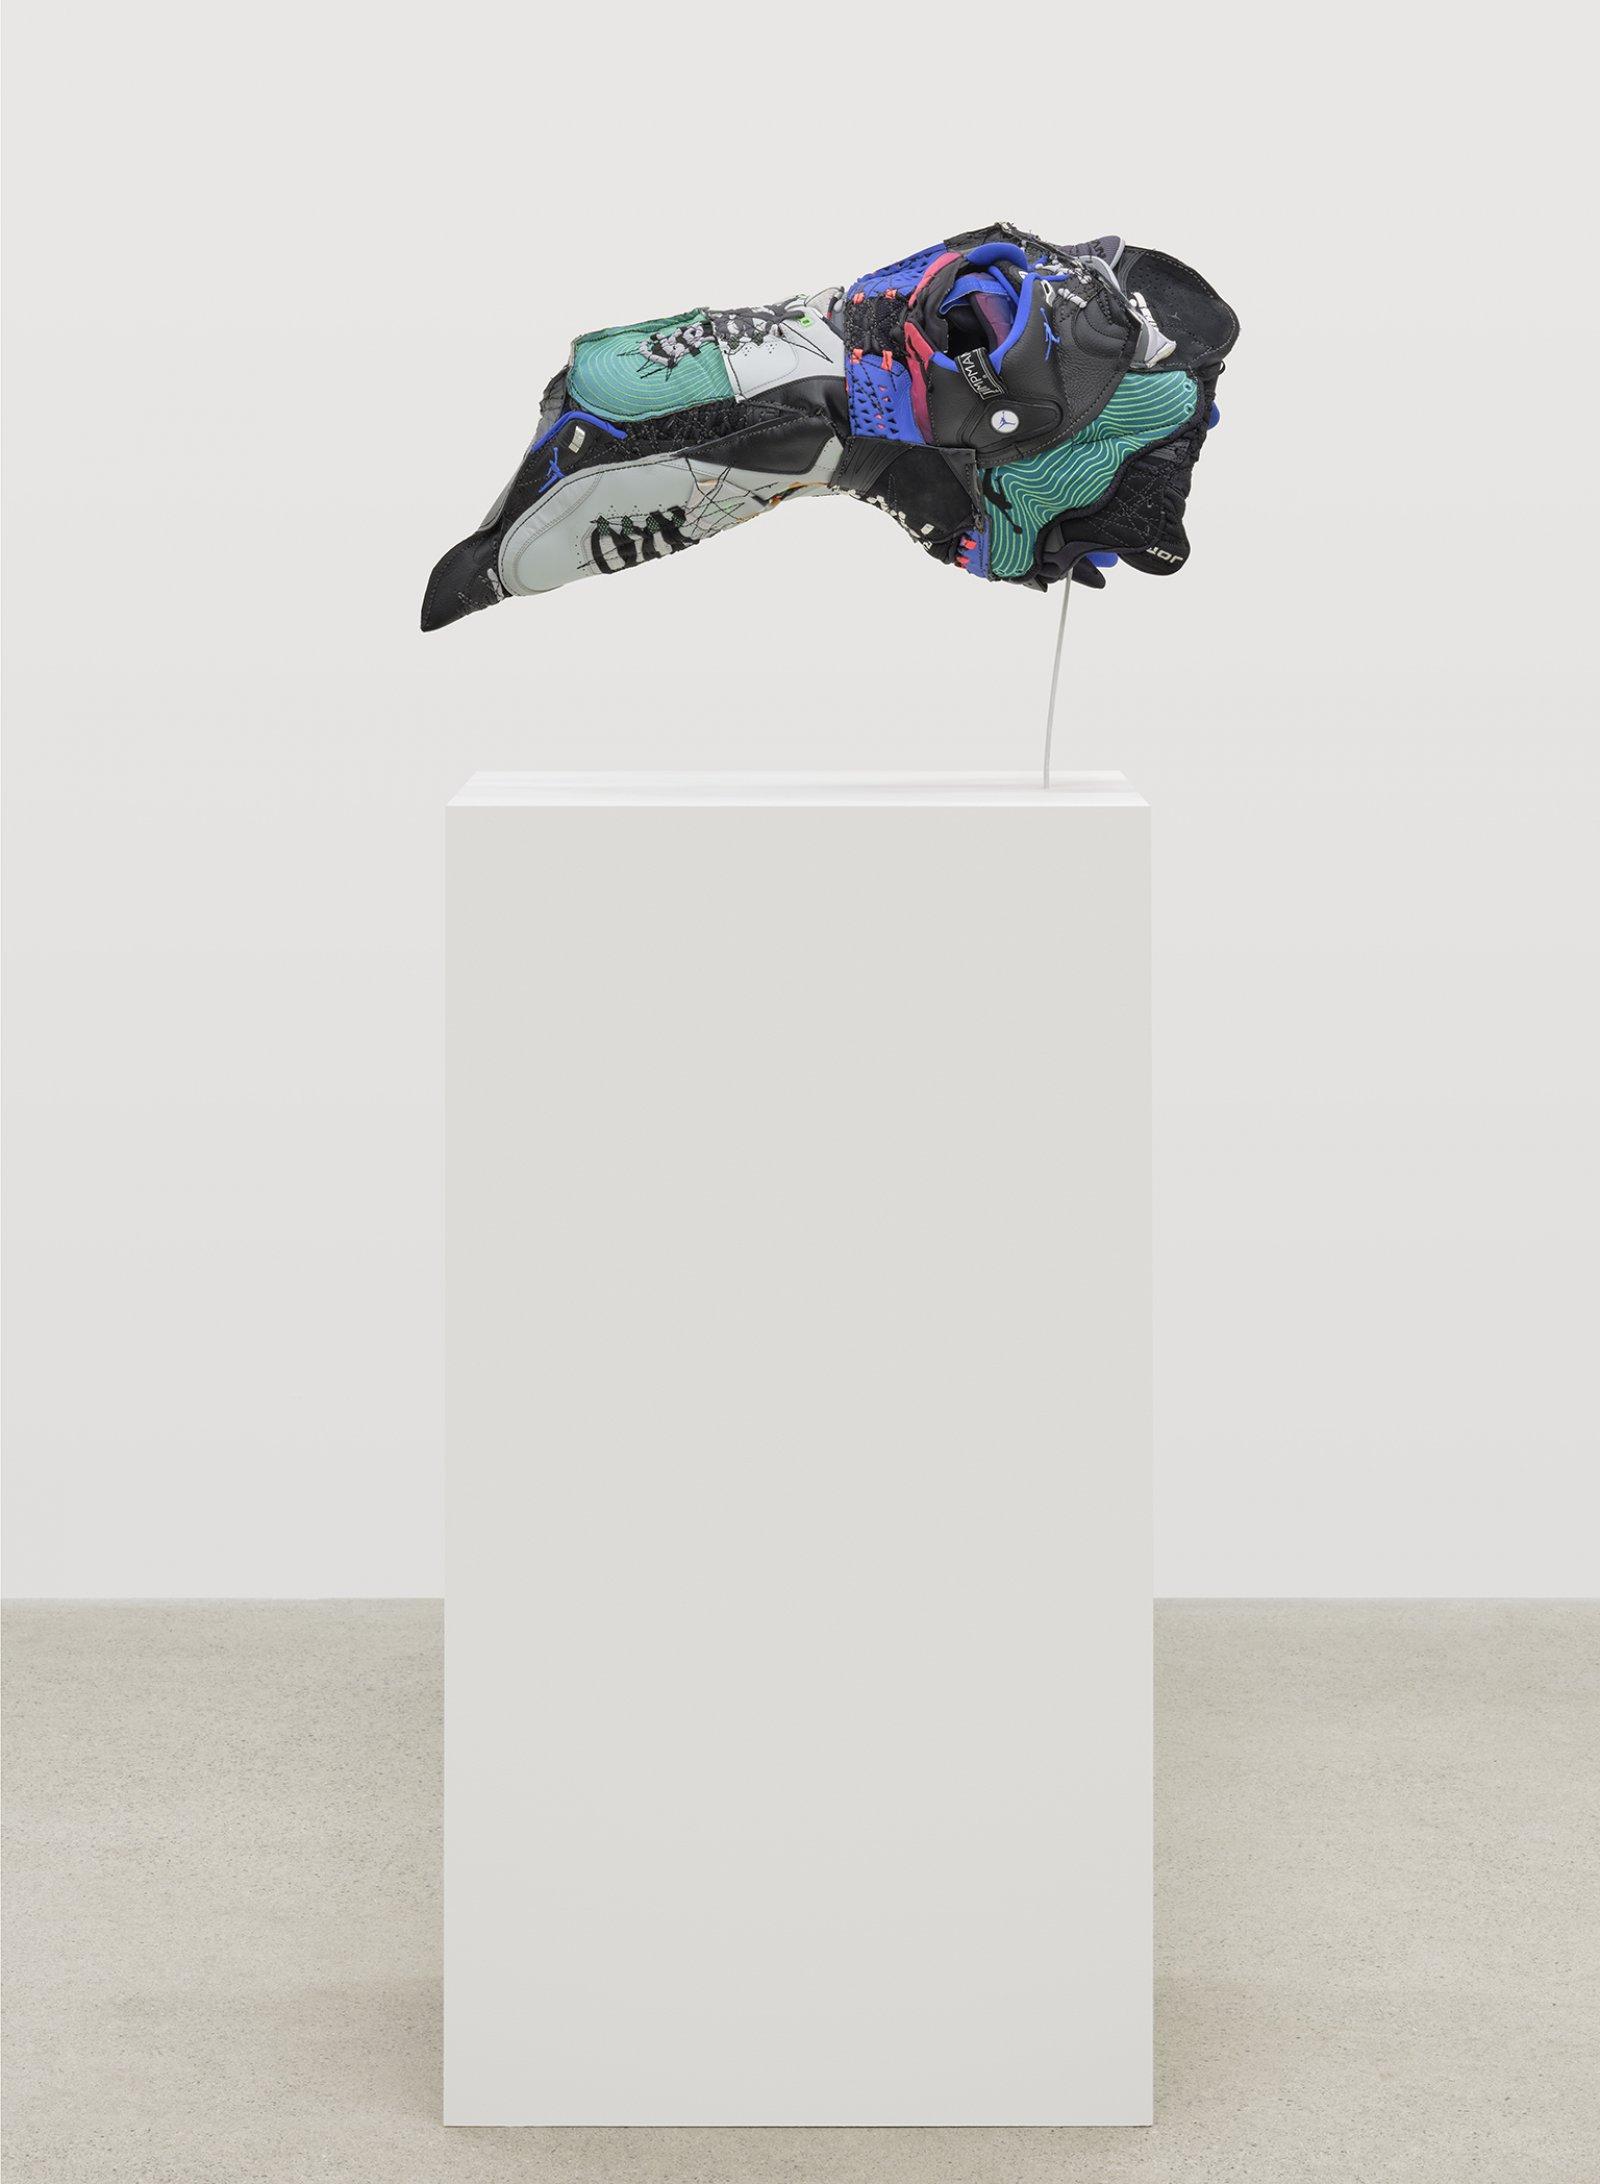 Brian Jungen, Plague Mask, 2020, nike air jordans, 14 x 27 x 16 in. (34 x 69 x 41 cm)